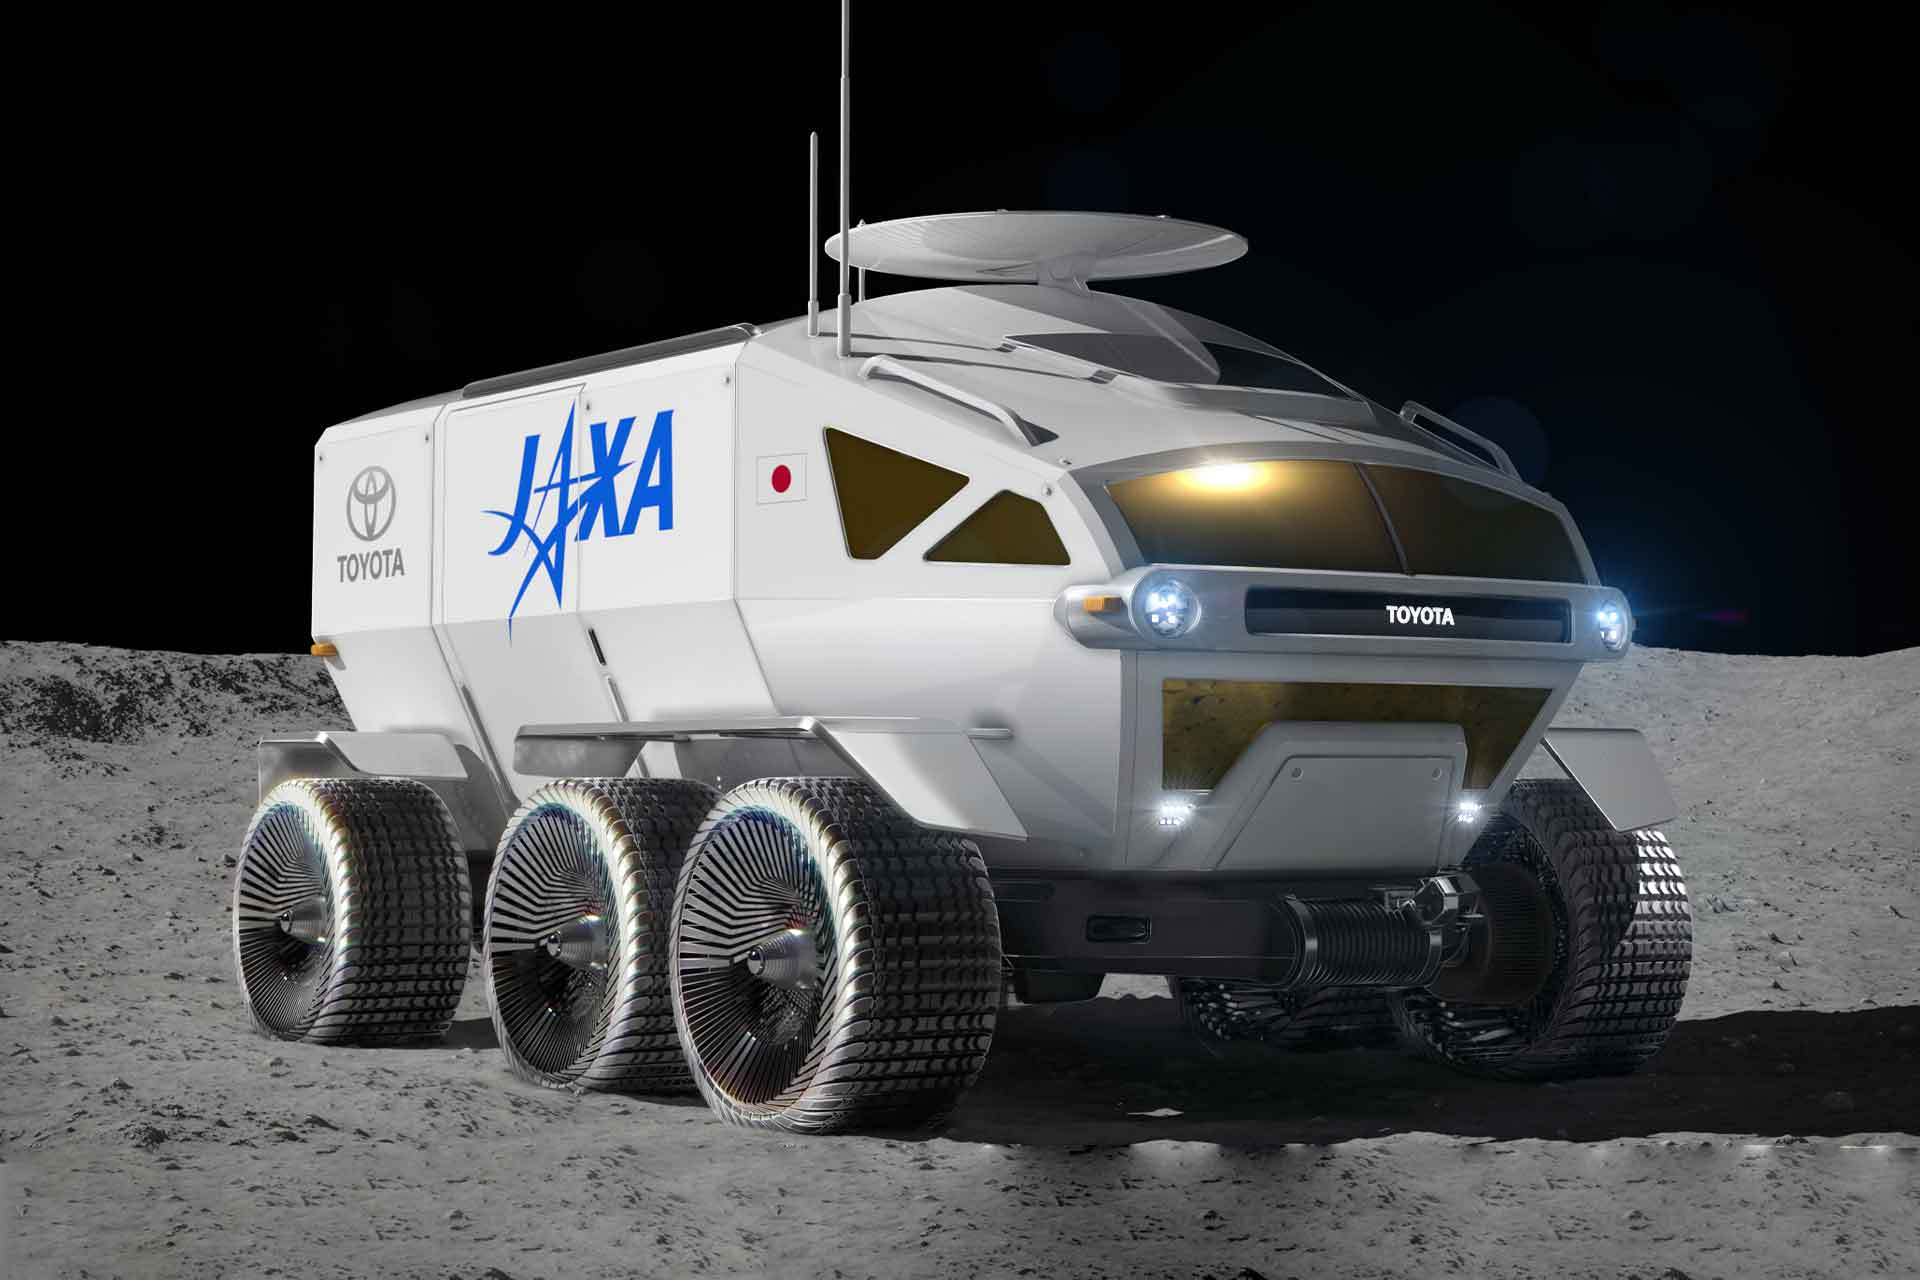 JAXA x Toyota Lunar Rover